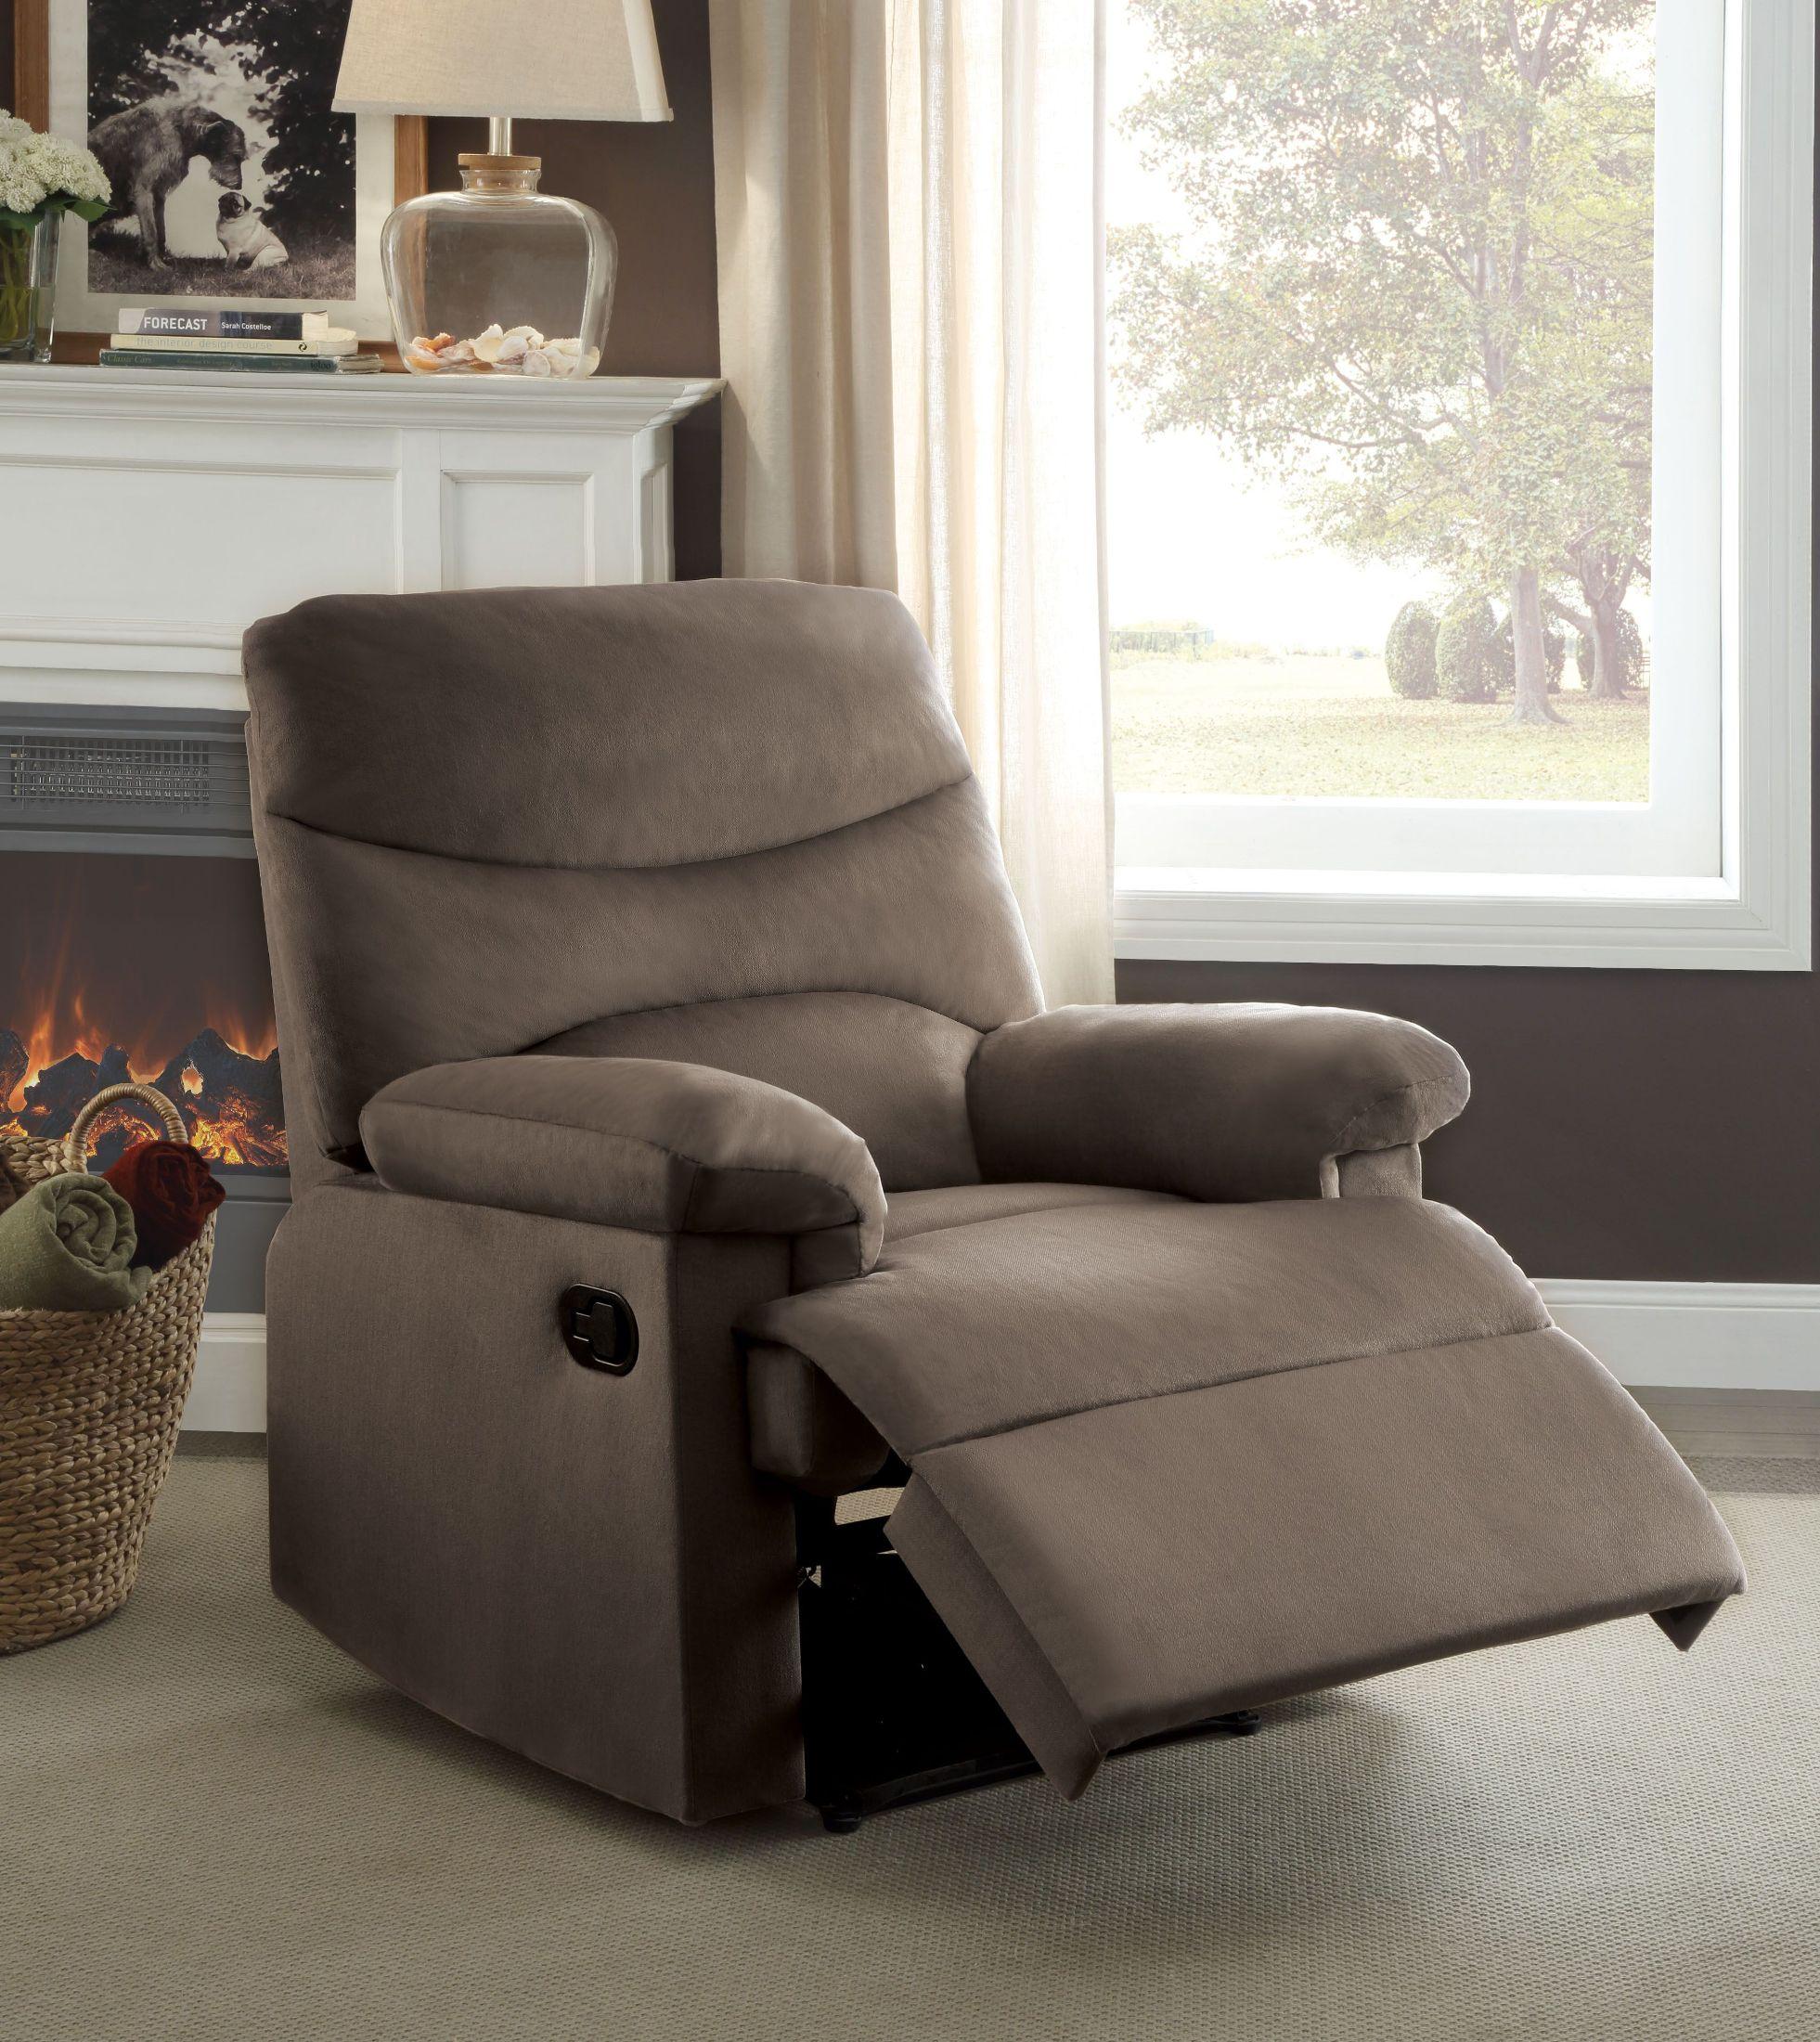 Ashley Furniture Arcadia: Arcadia Light Brown Woven Recliner